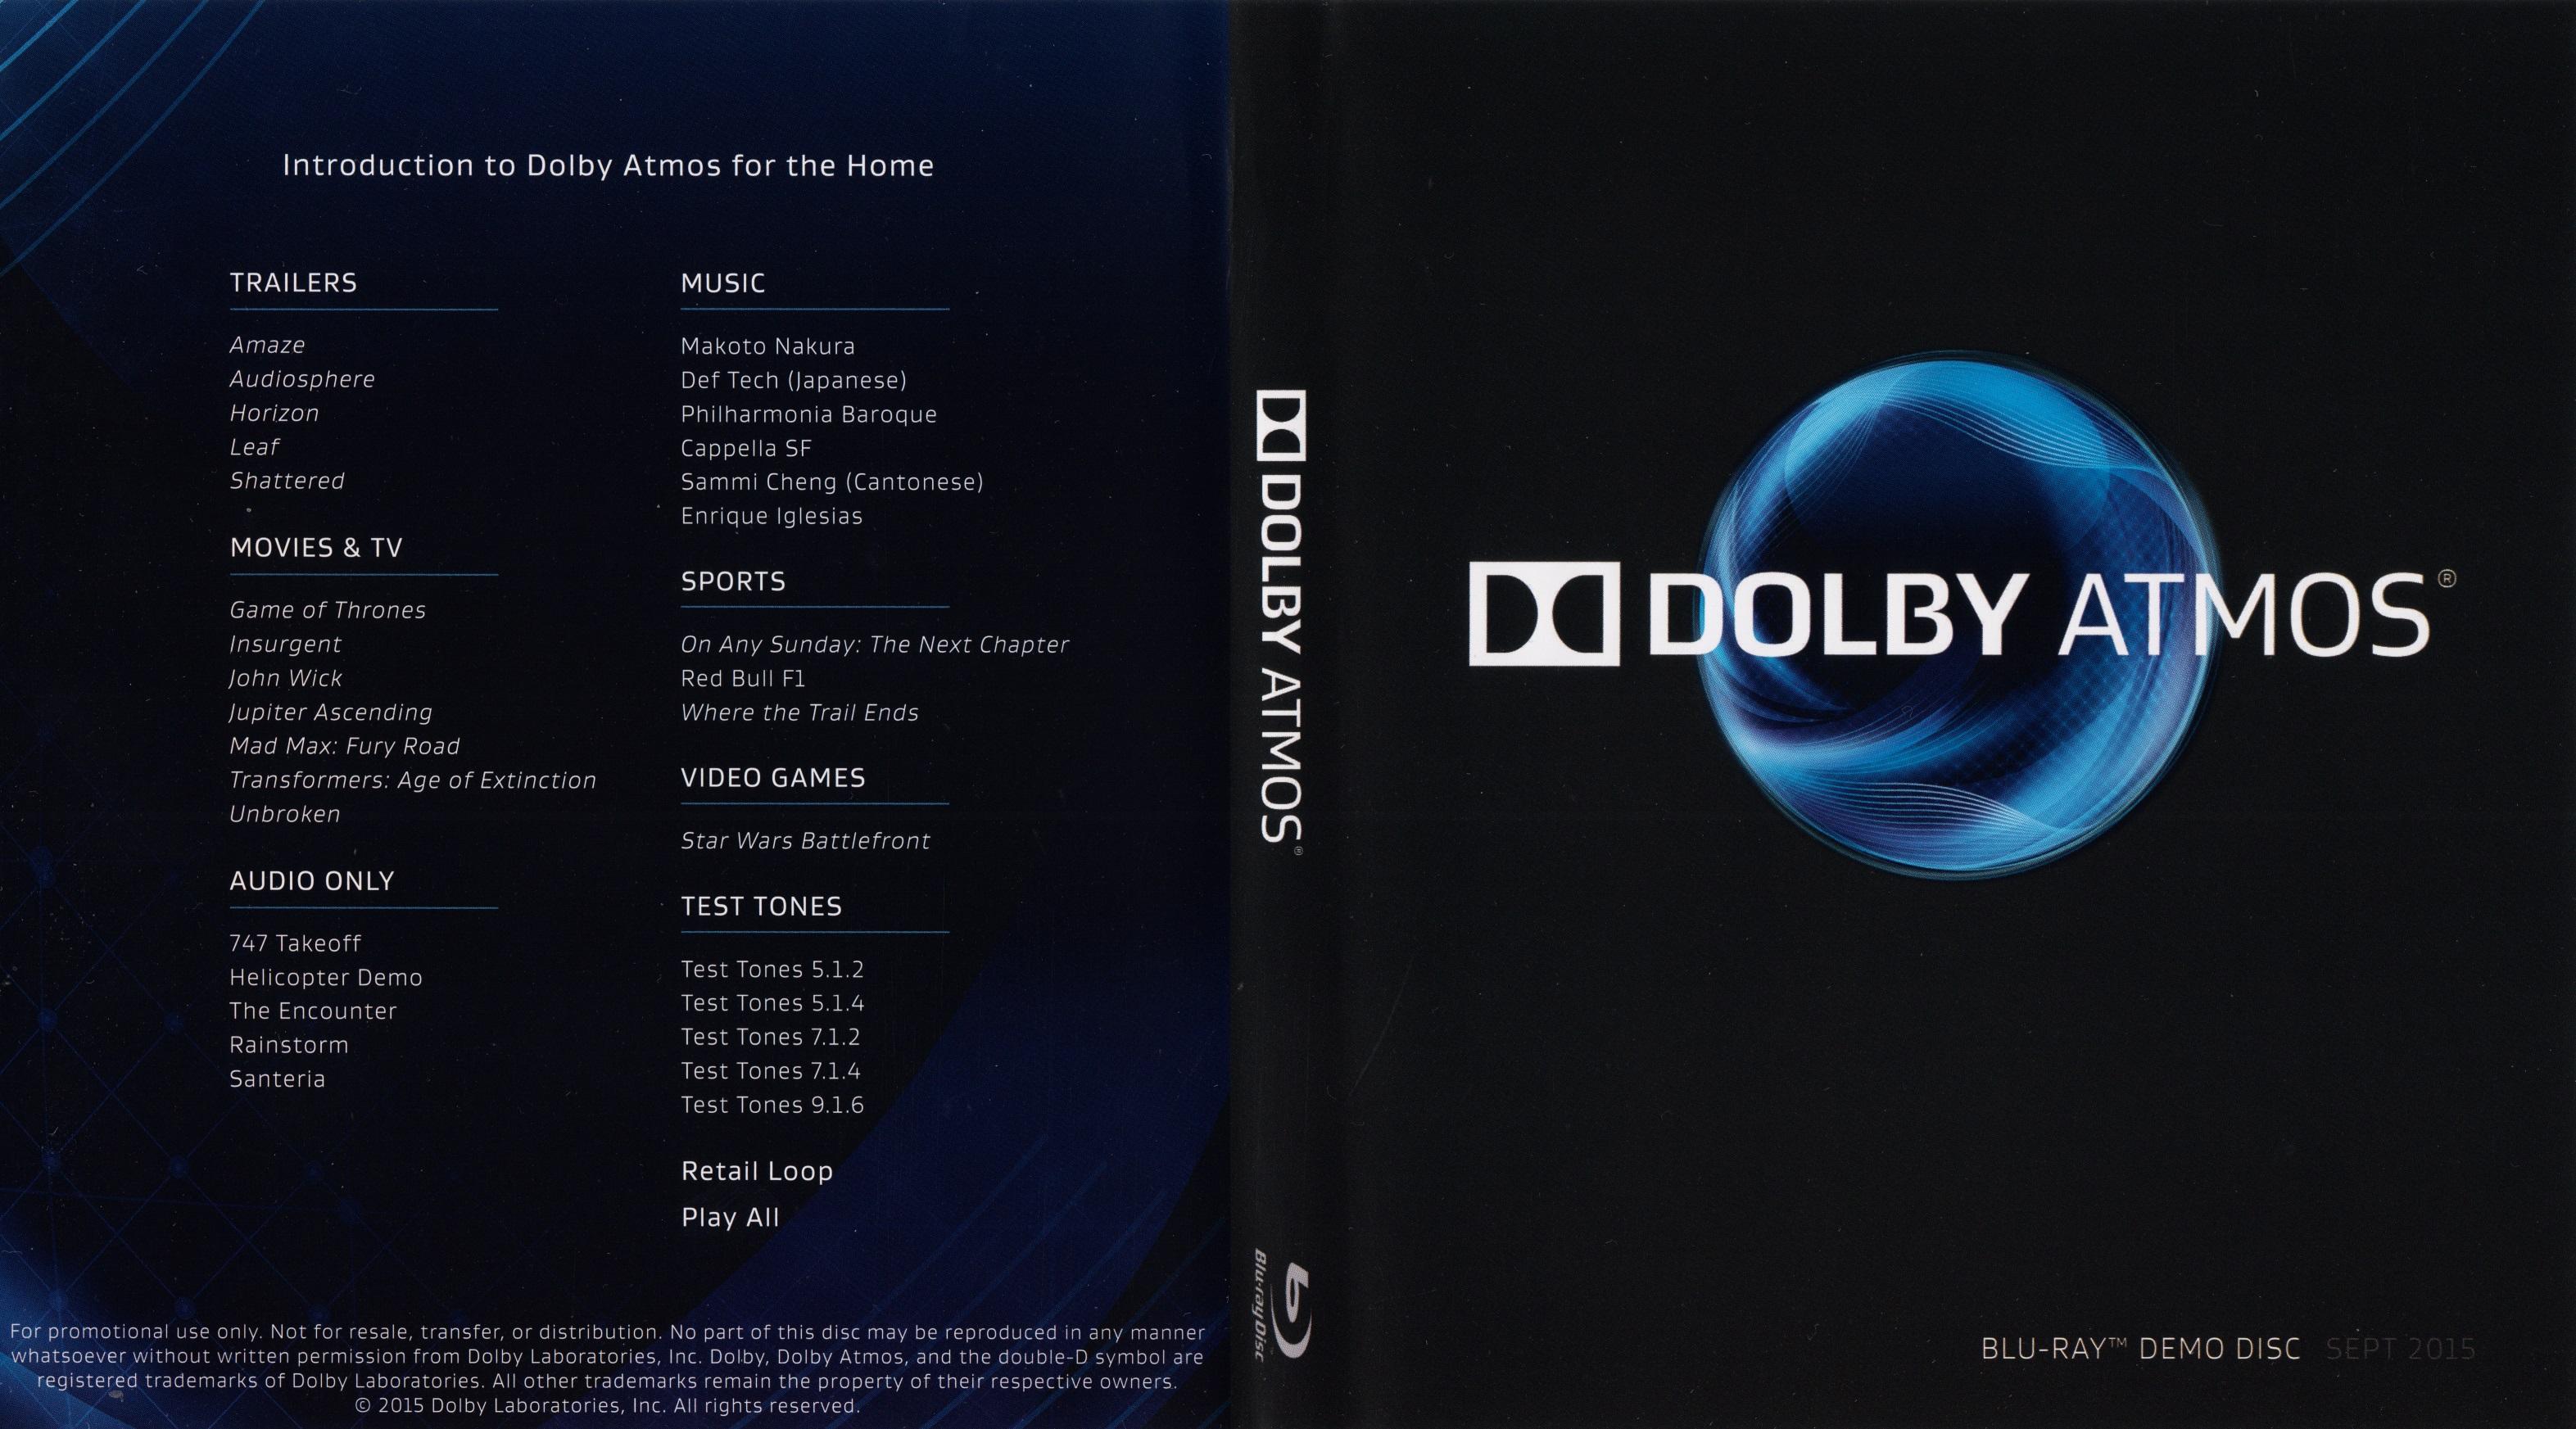 auro 3d demo disc vol 1